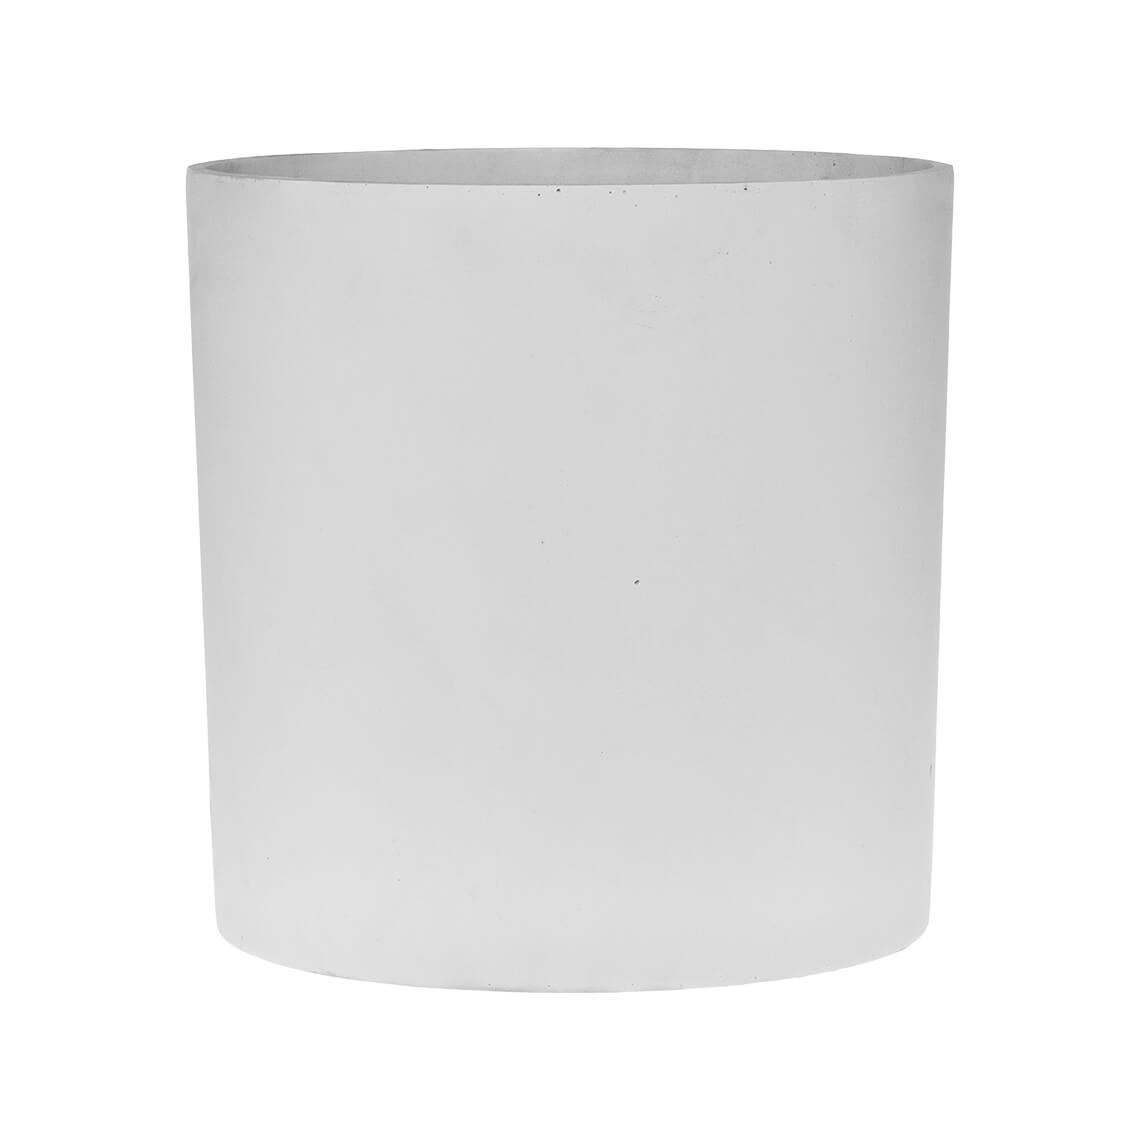 Akiyo Medium Planter Size W 31cm x D 31cm x H 31cm in White 50% Poly Resin/50% Stone Powder Freedom